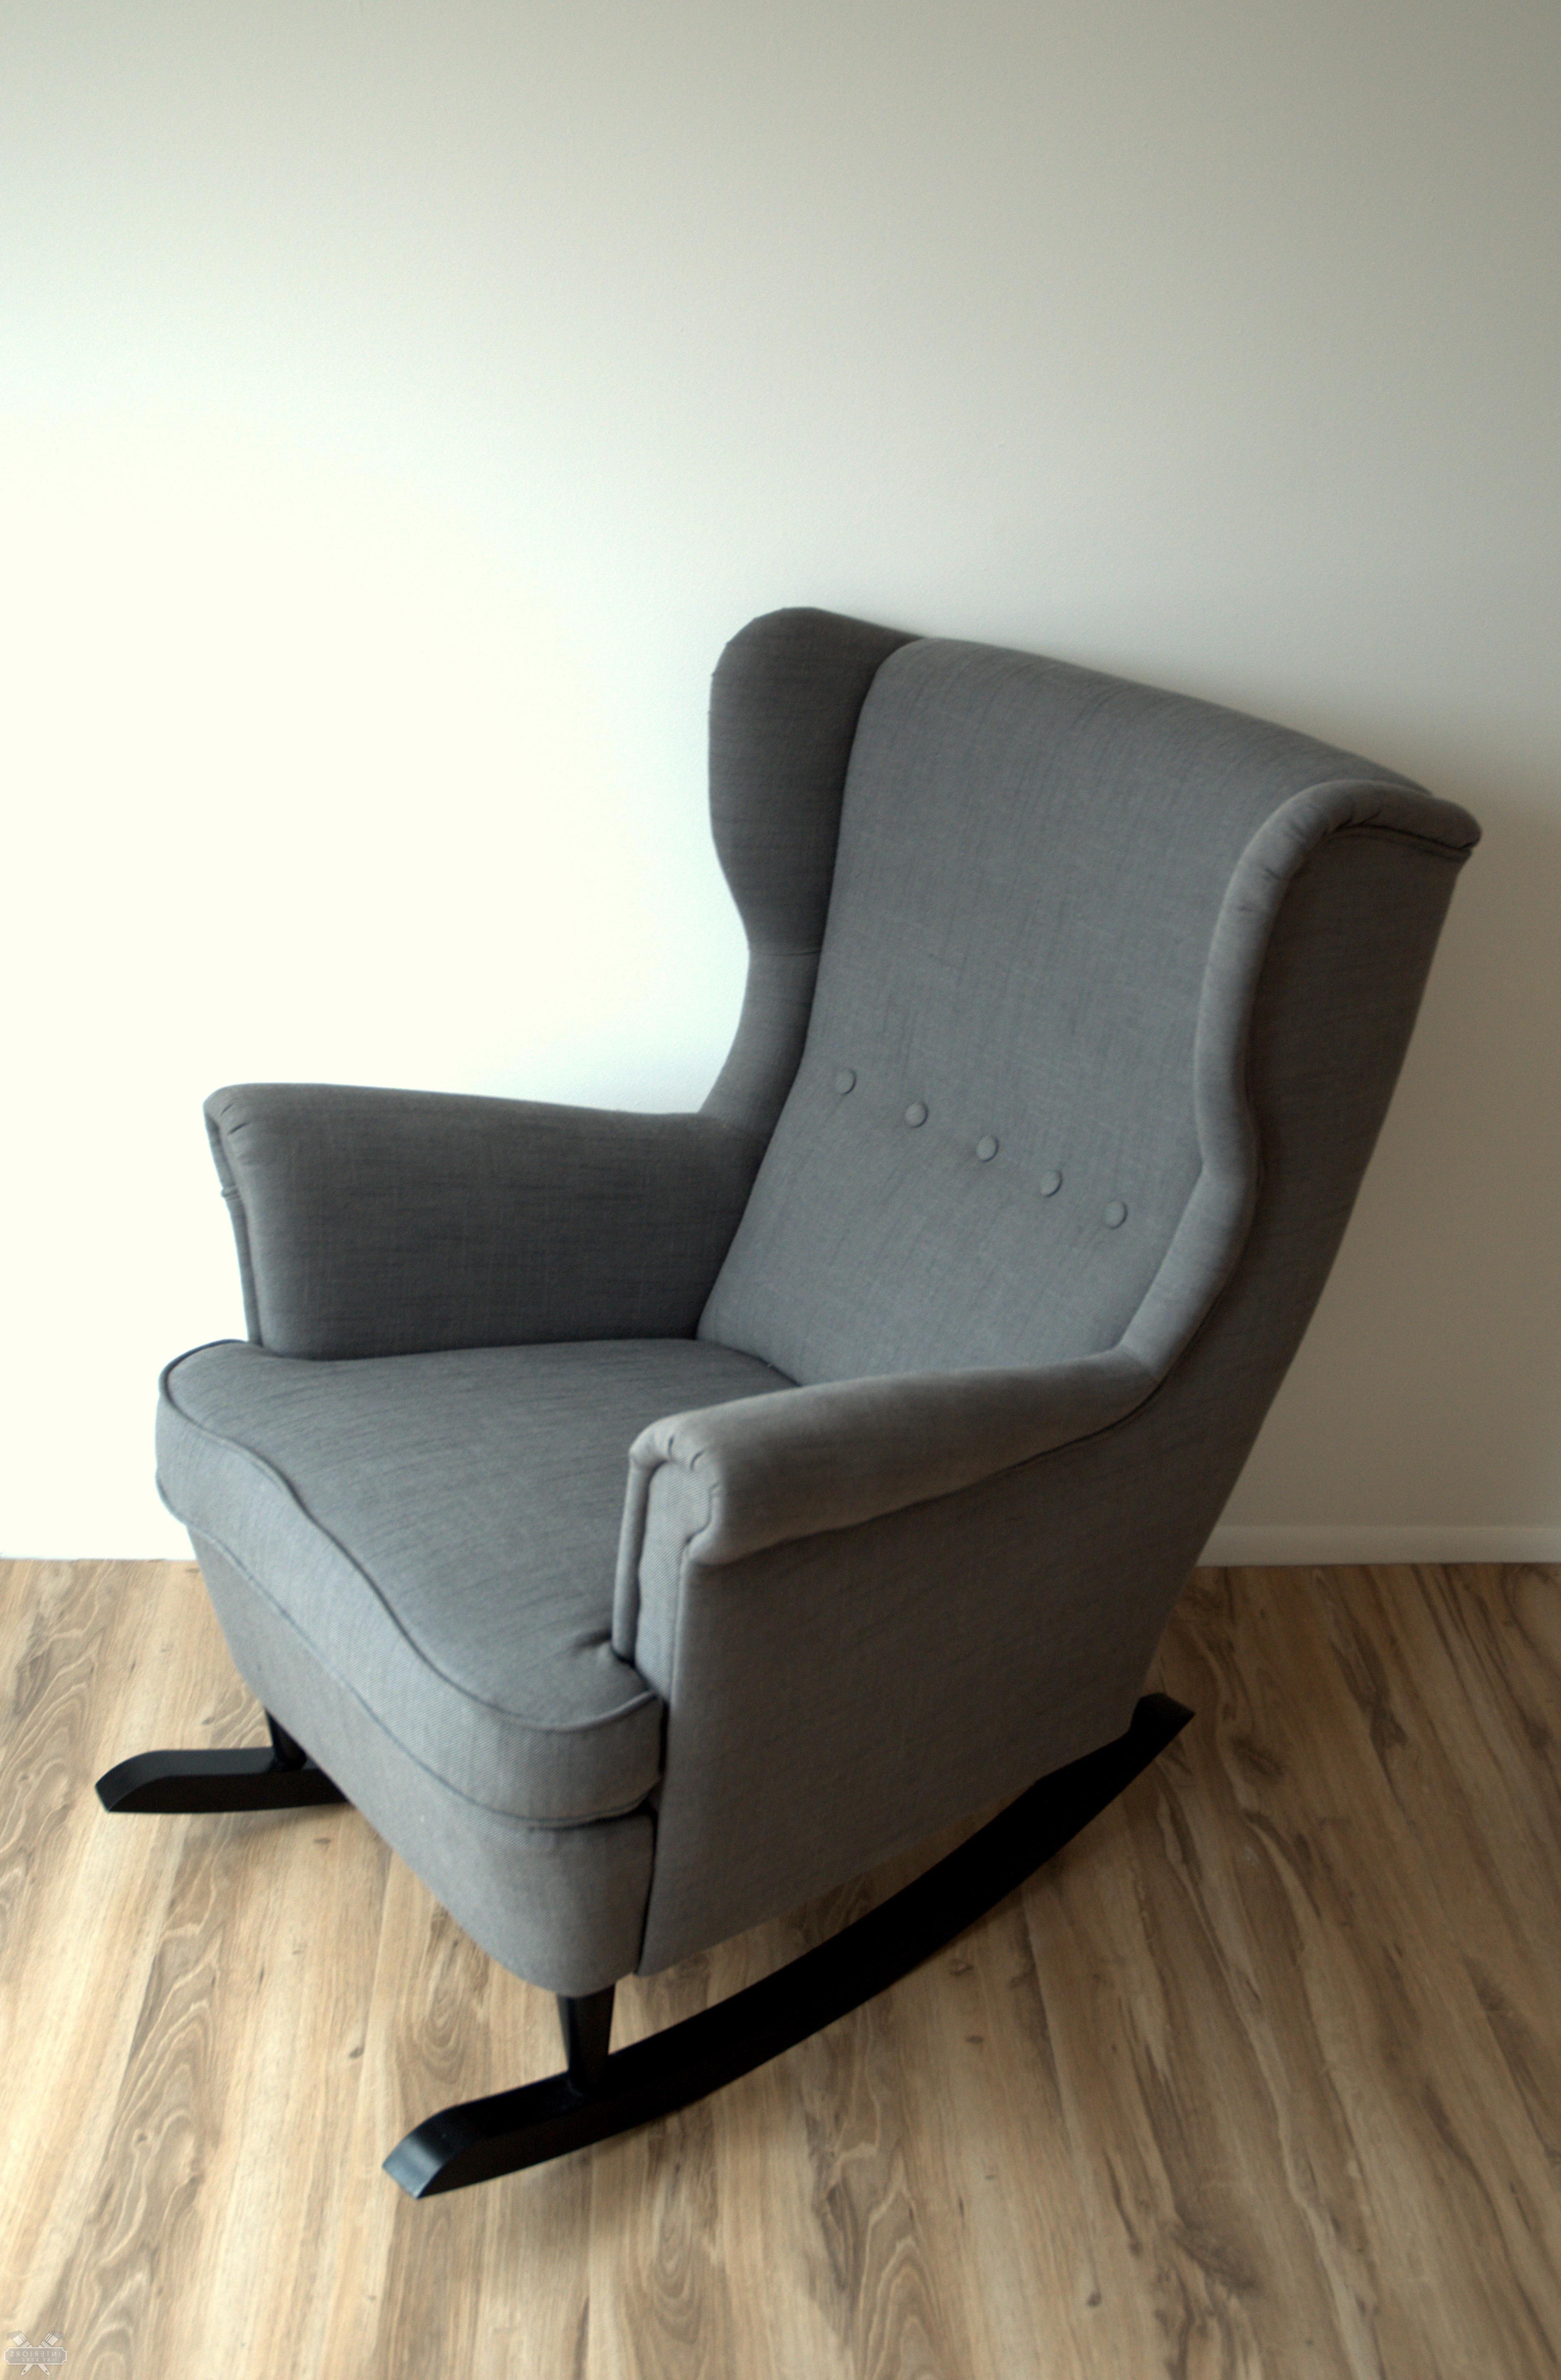 Ikea Hack: Strandmon Rocker {diy Wingback Rocking Chair} (View 5 of 20)